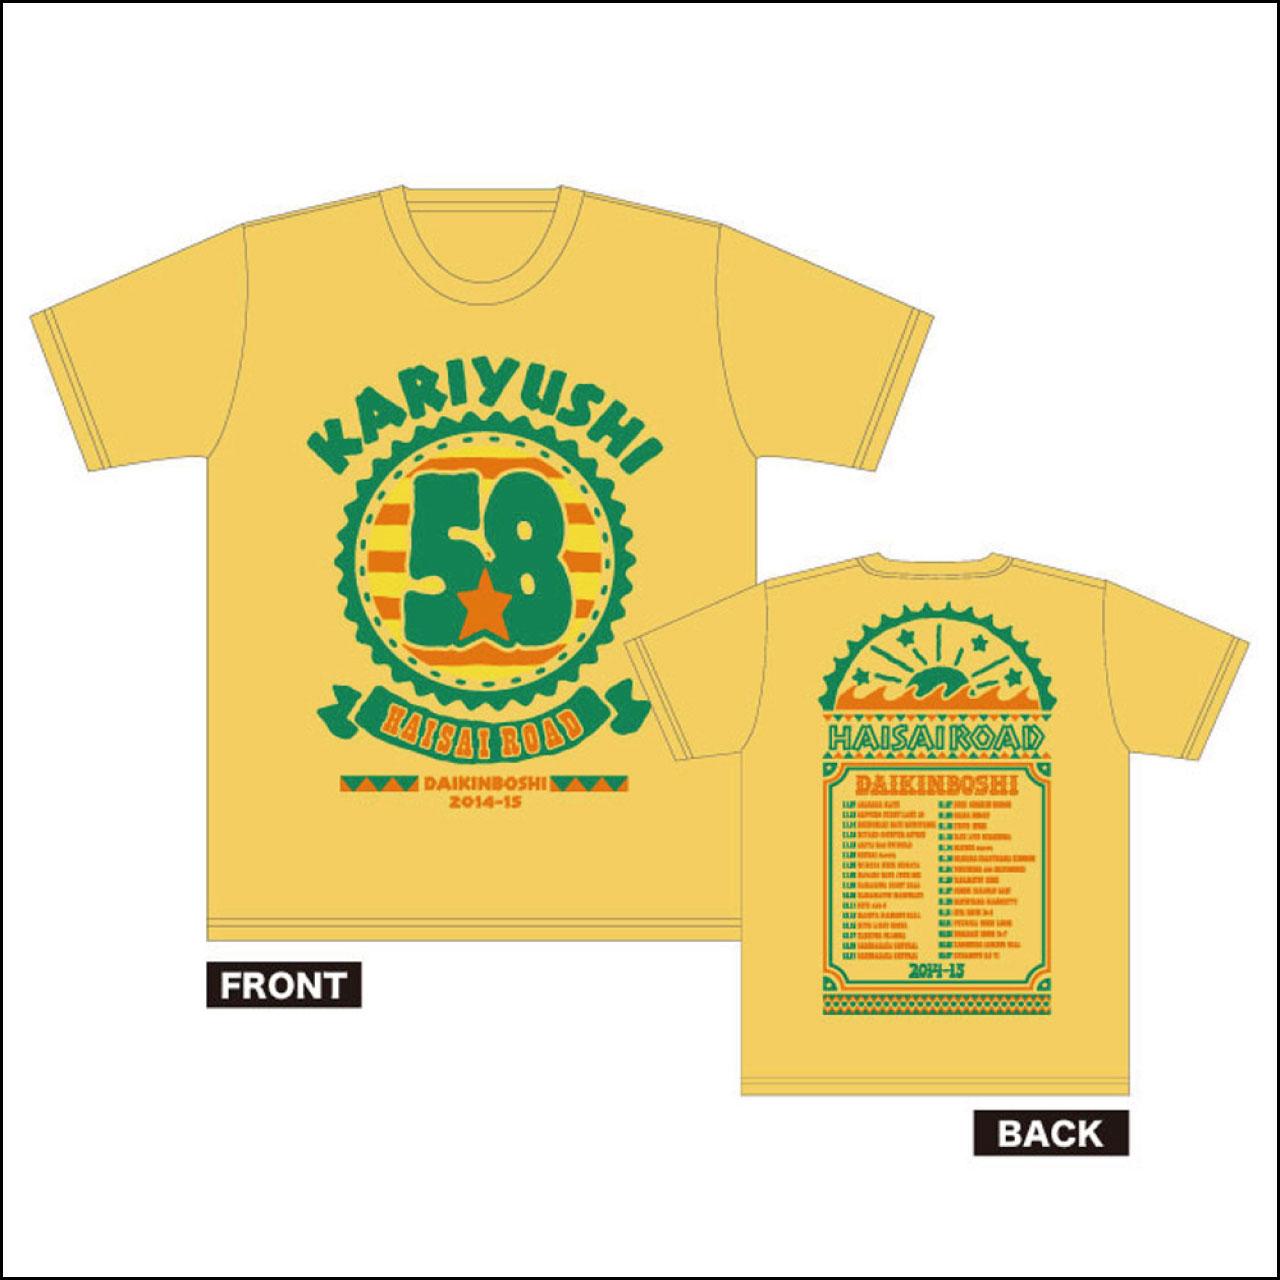 【LAST SALE】大金星「南国ロゴ」Tシャツ